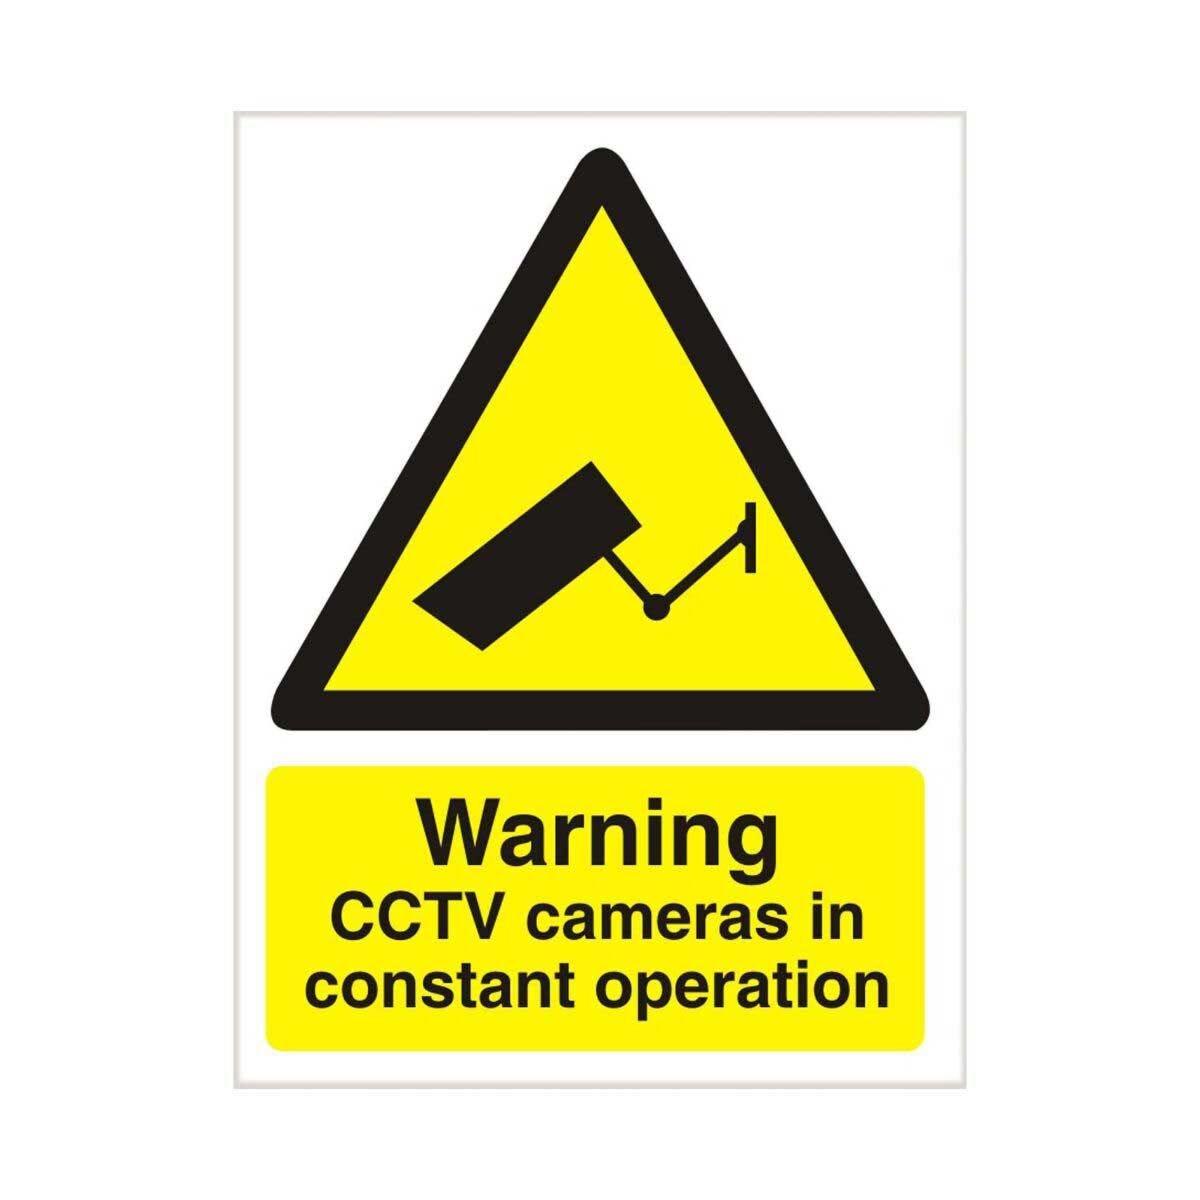 Warning CCTV In Operation 150 x 200mm